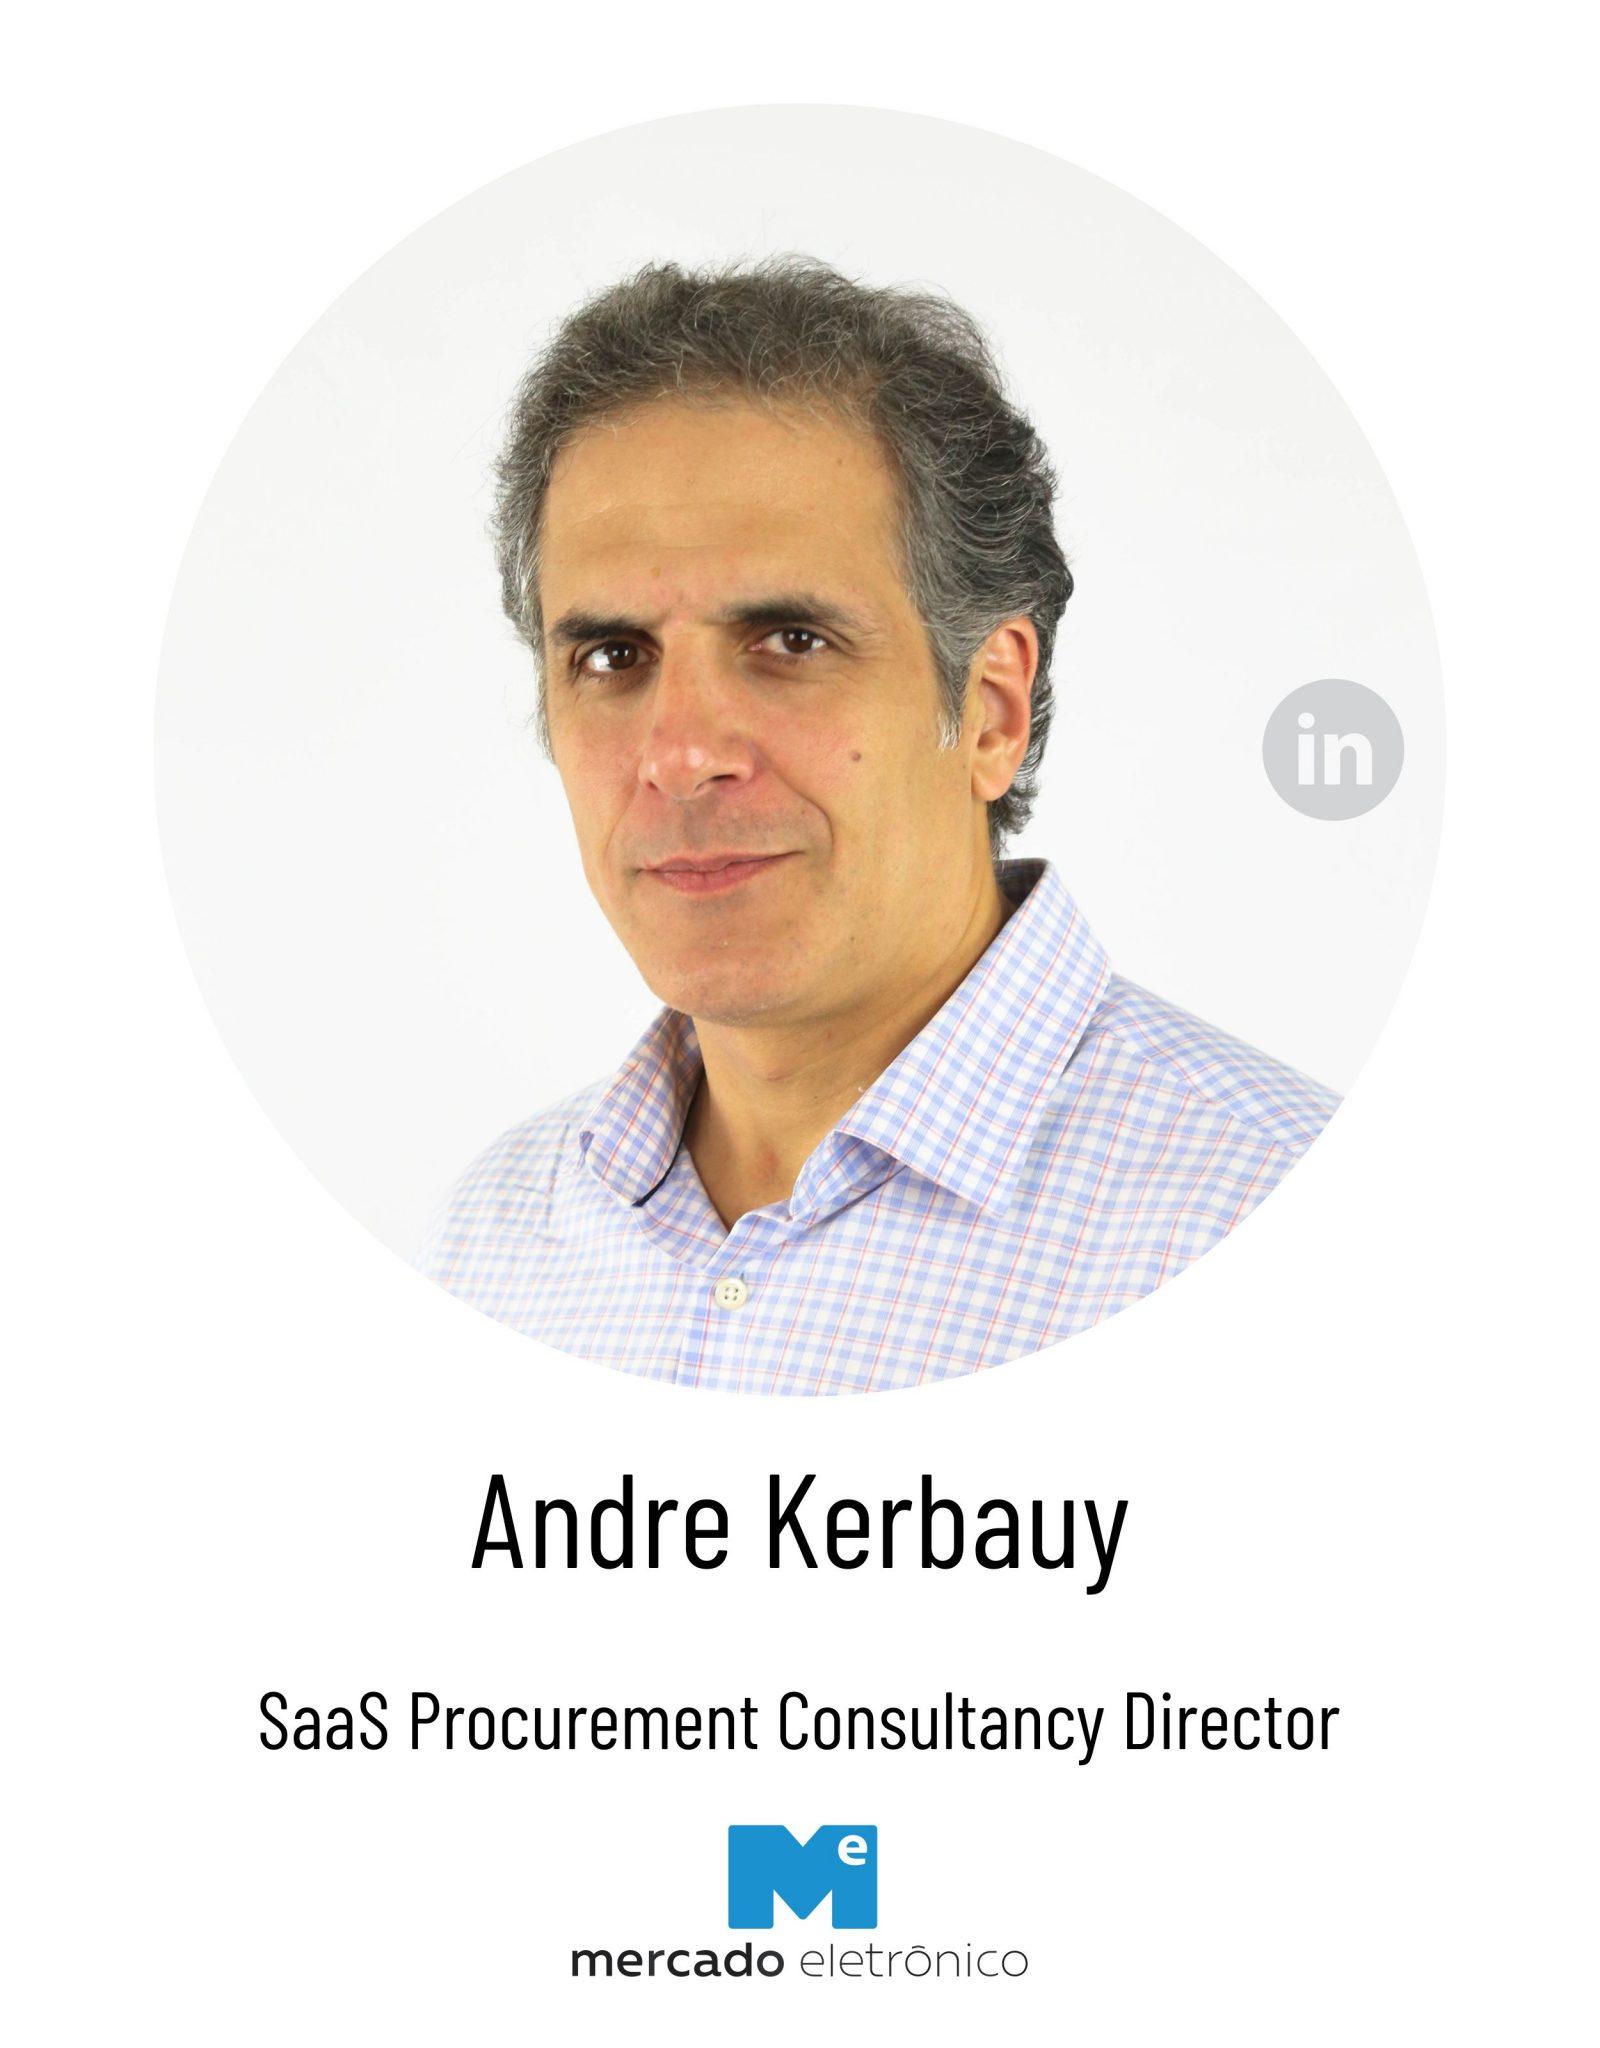 Andre Kerbauy